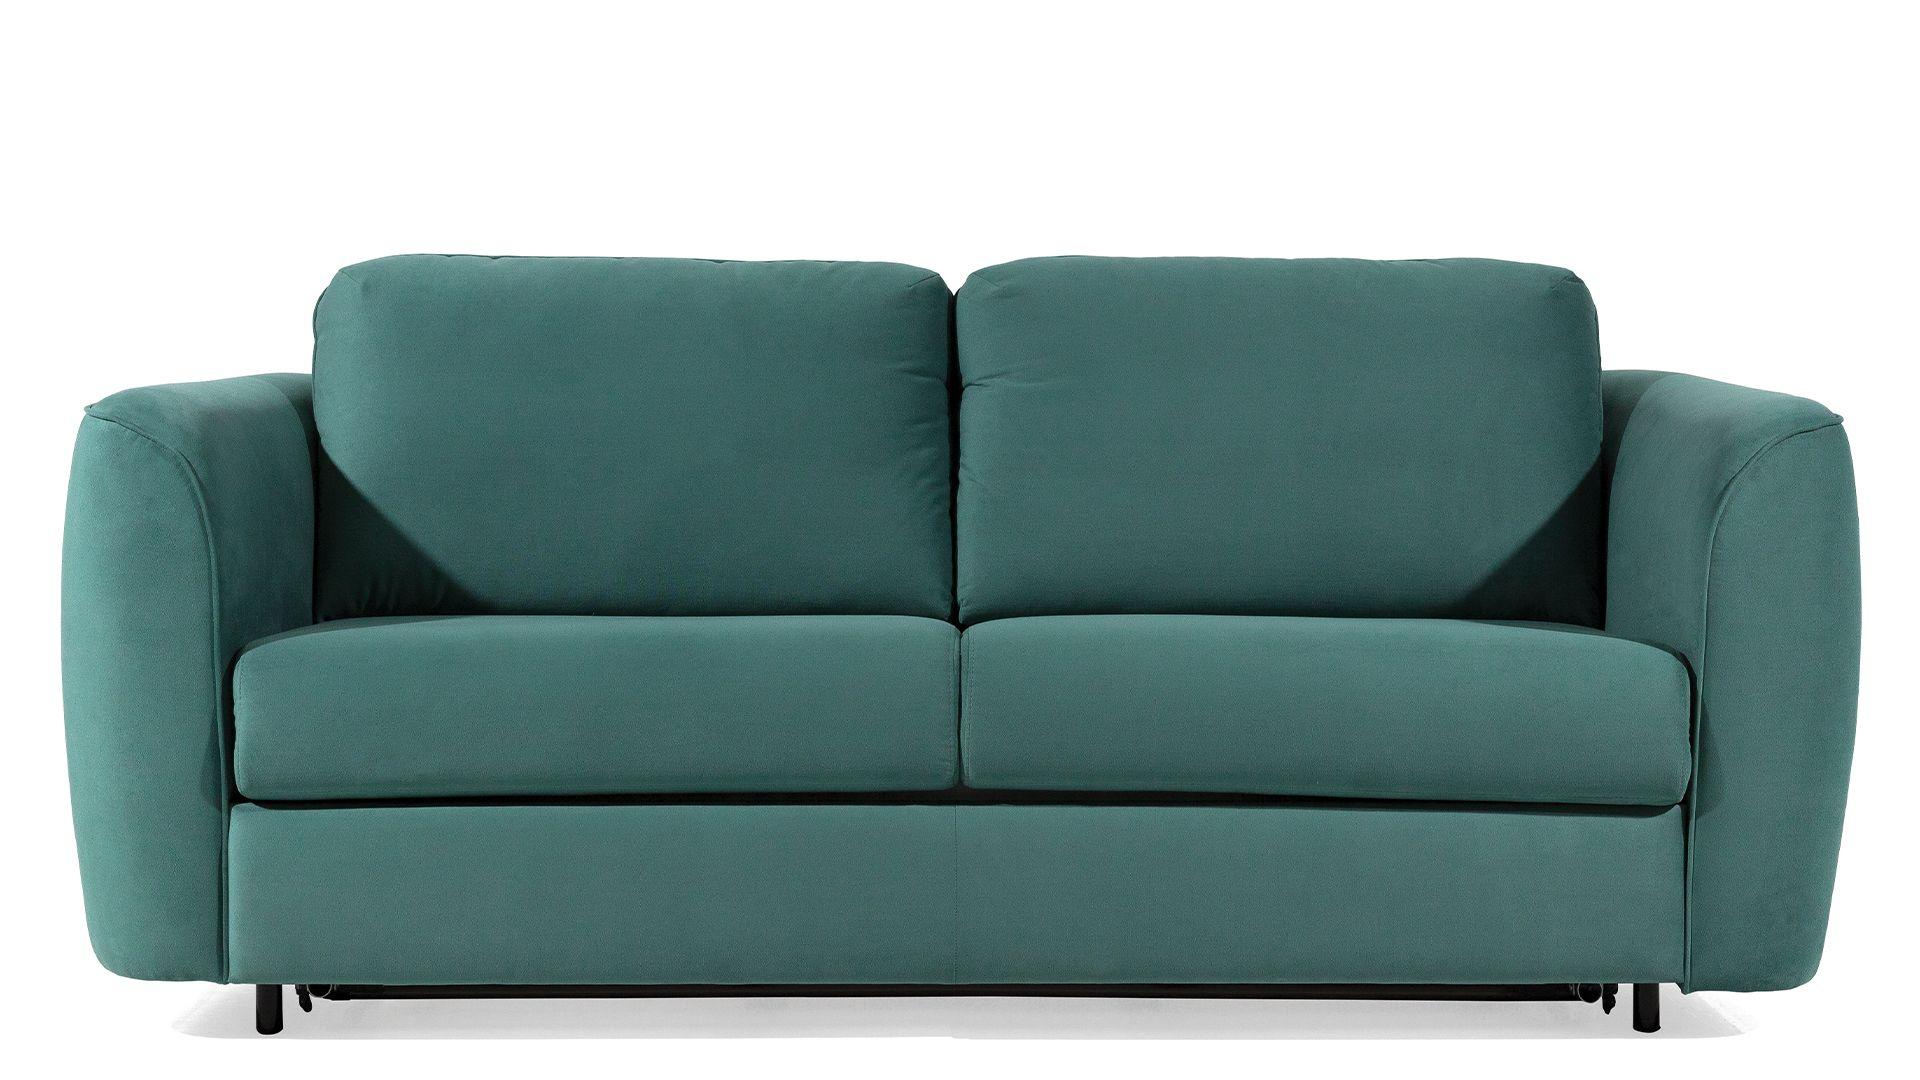 Sofa with sleeping function Cali 120